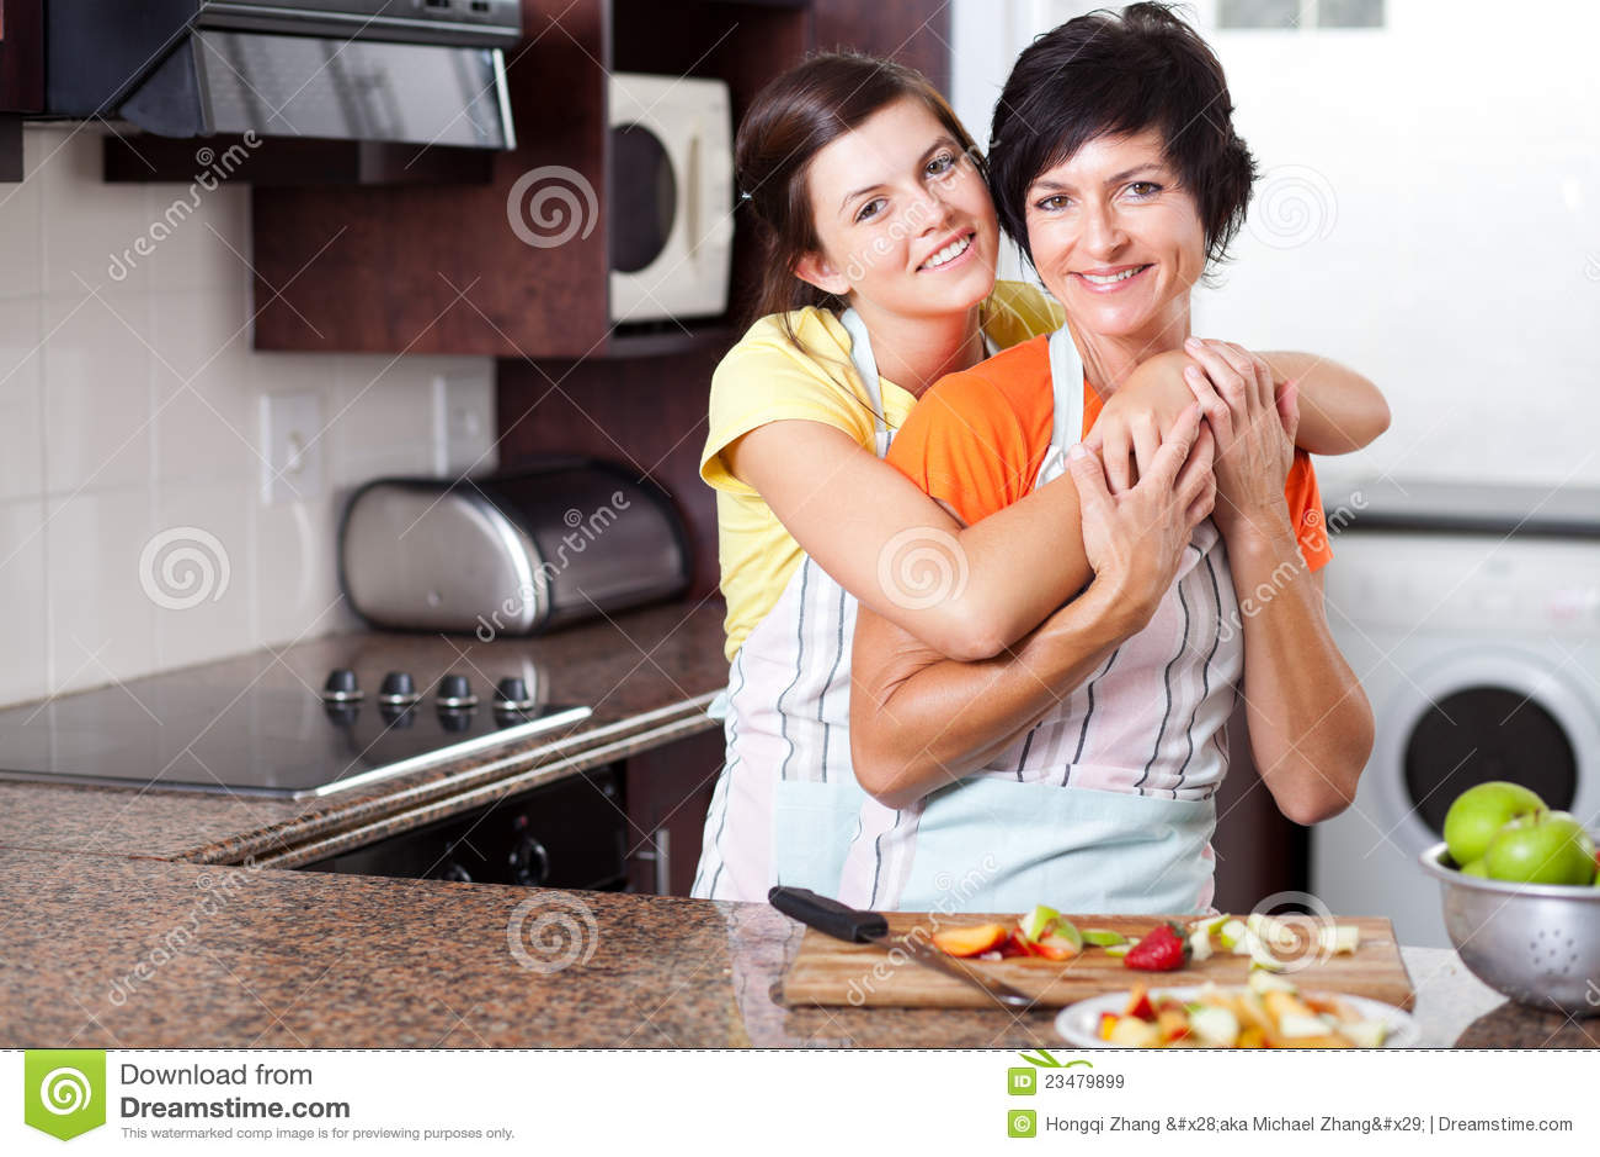 Сын с матерью на кухне 10 фотография